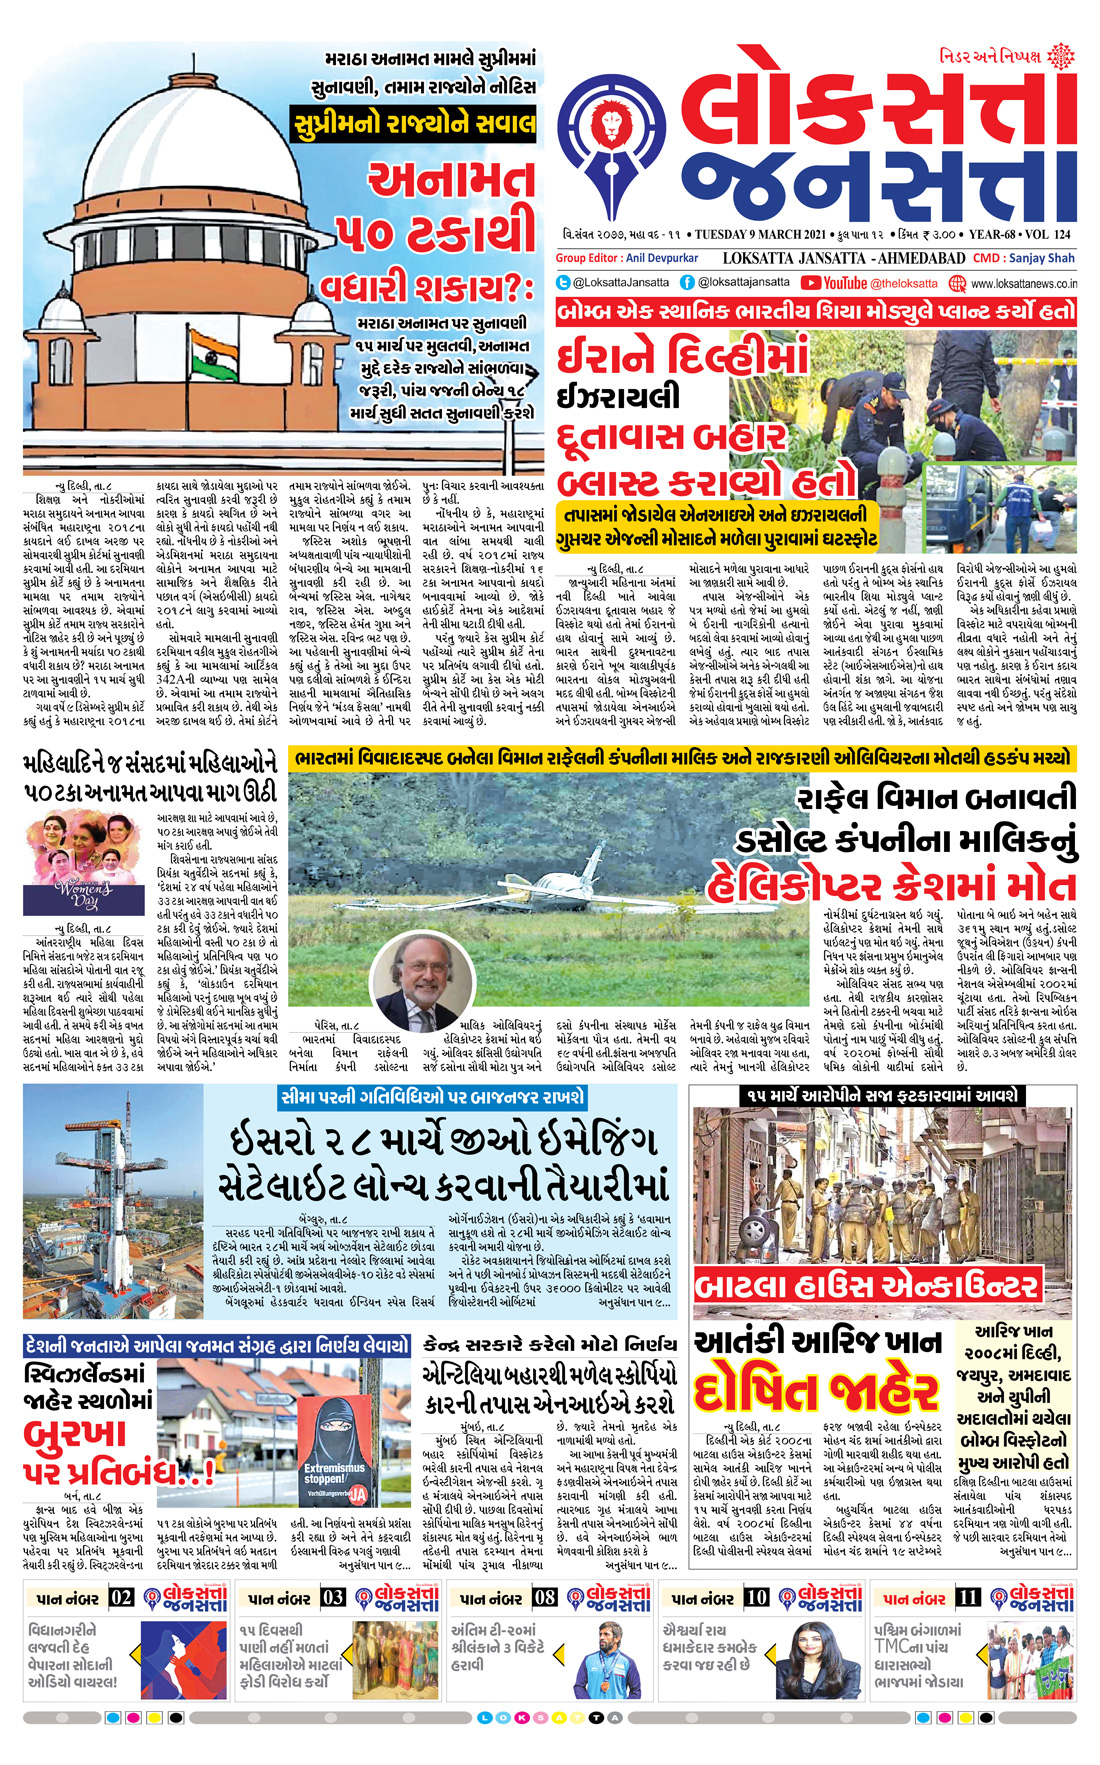 Loksatta Jansatta News Papaer E-paper dated 2021-03-09 | Page 1